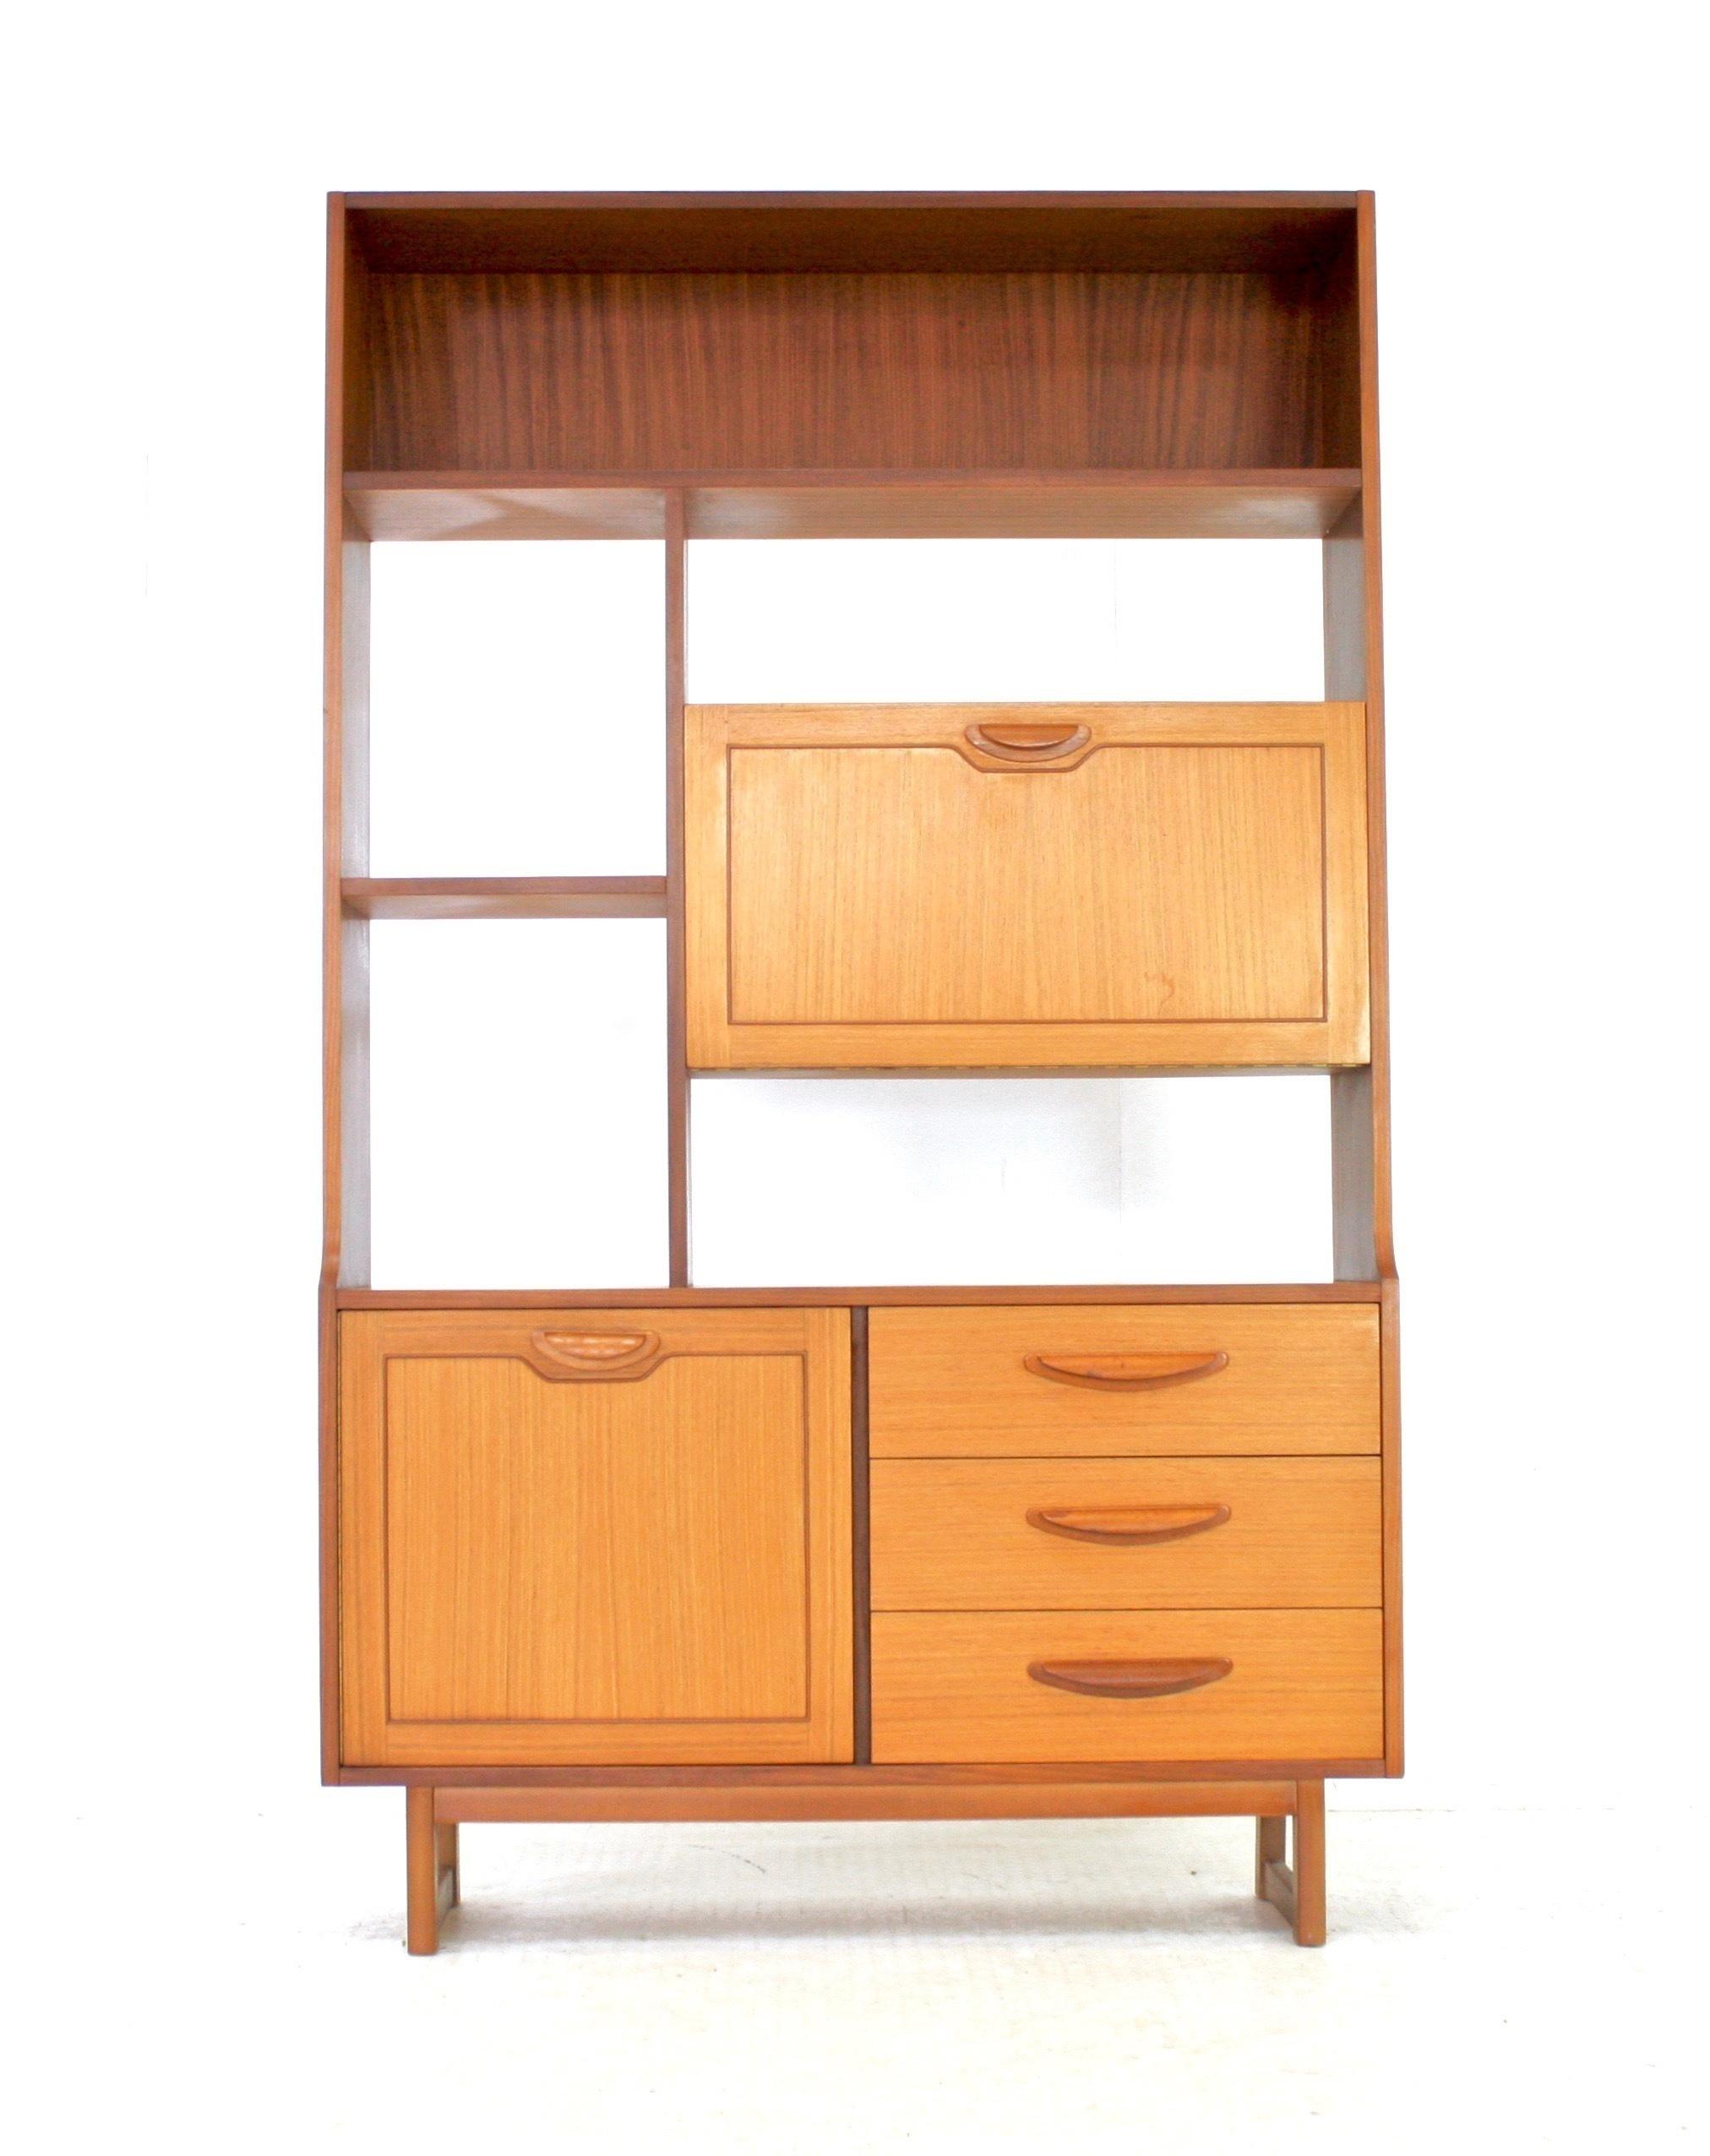 Tremendous Vintage 1970S Danish Influence Teak Stateroom Room Divider Interior Design Ideas Tzicisoteloinfo